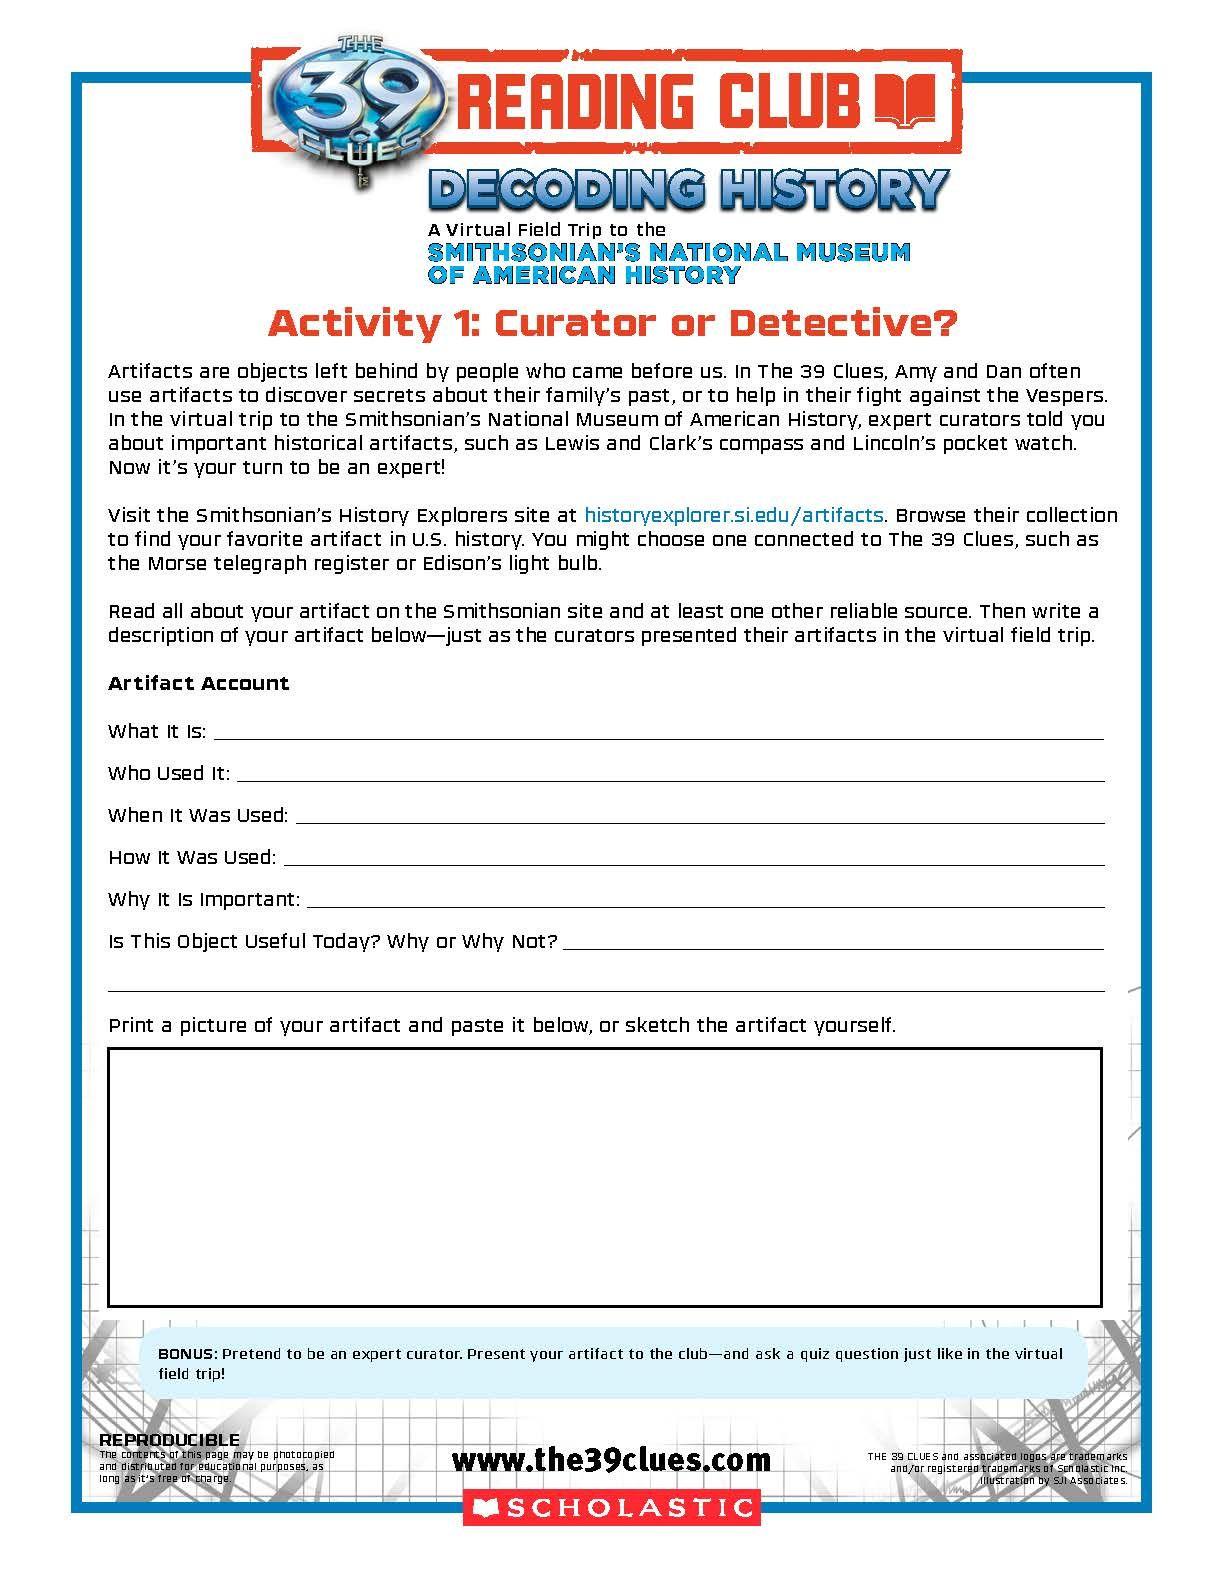 Free Common Core Ready Activity Sheet Based On Decoding